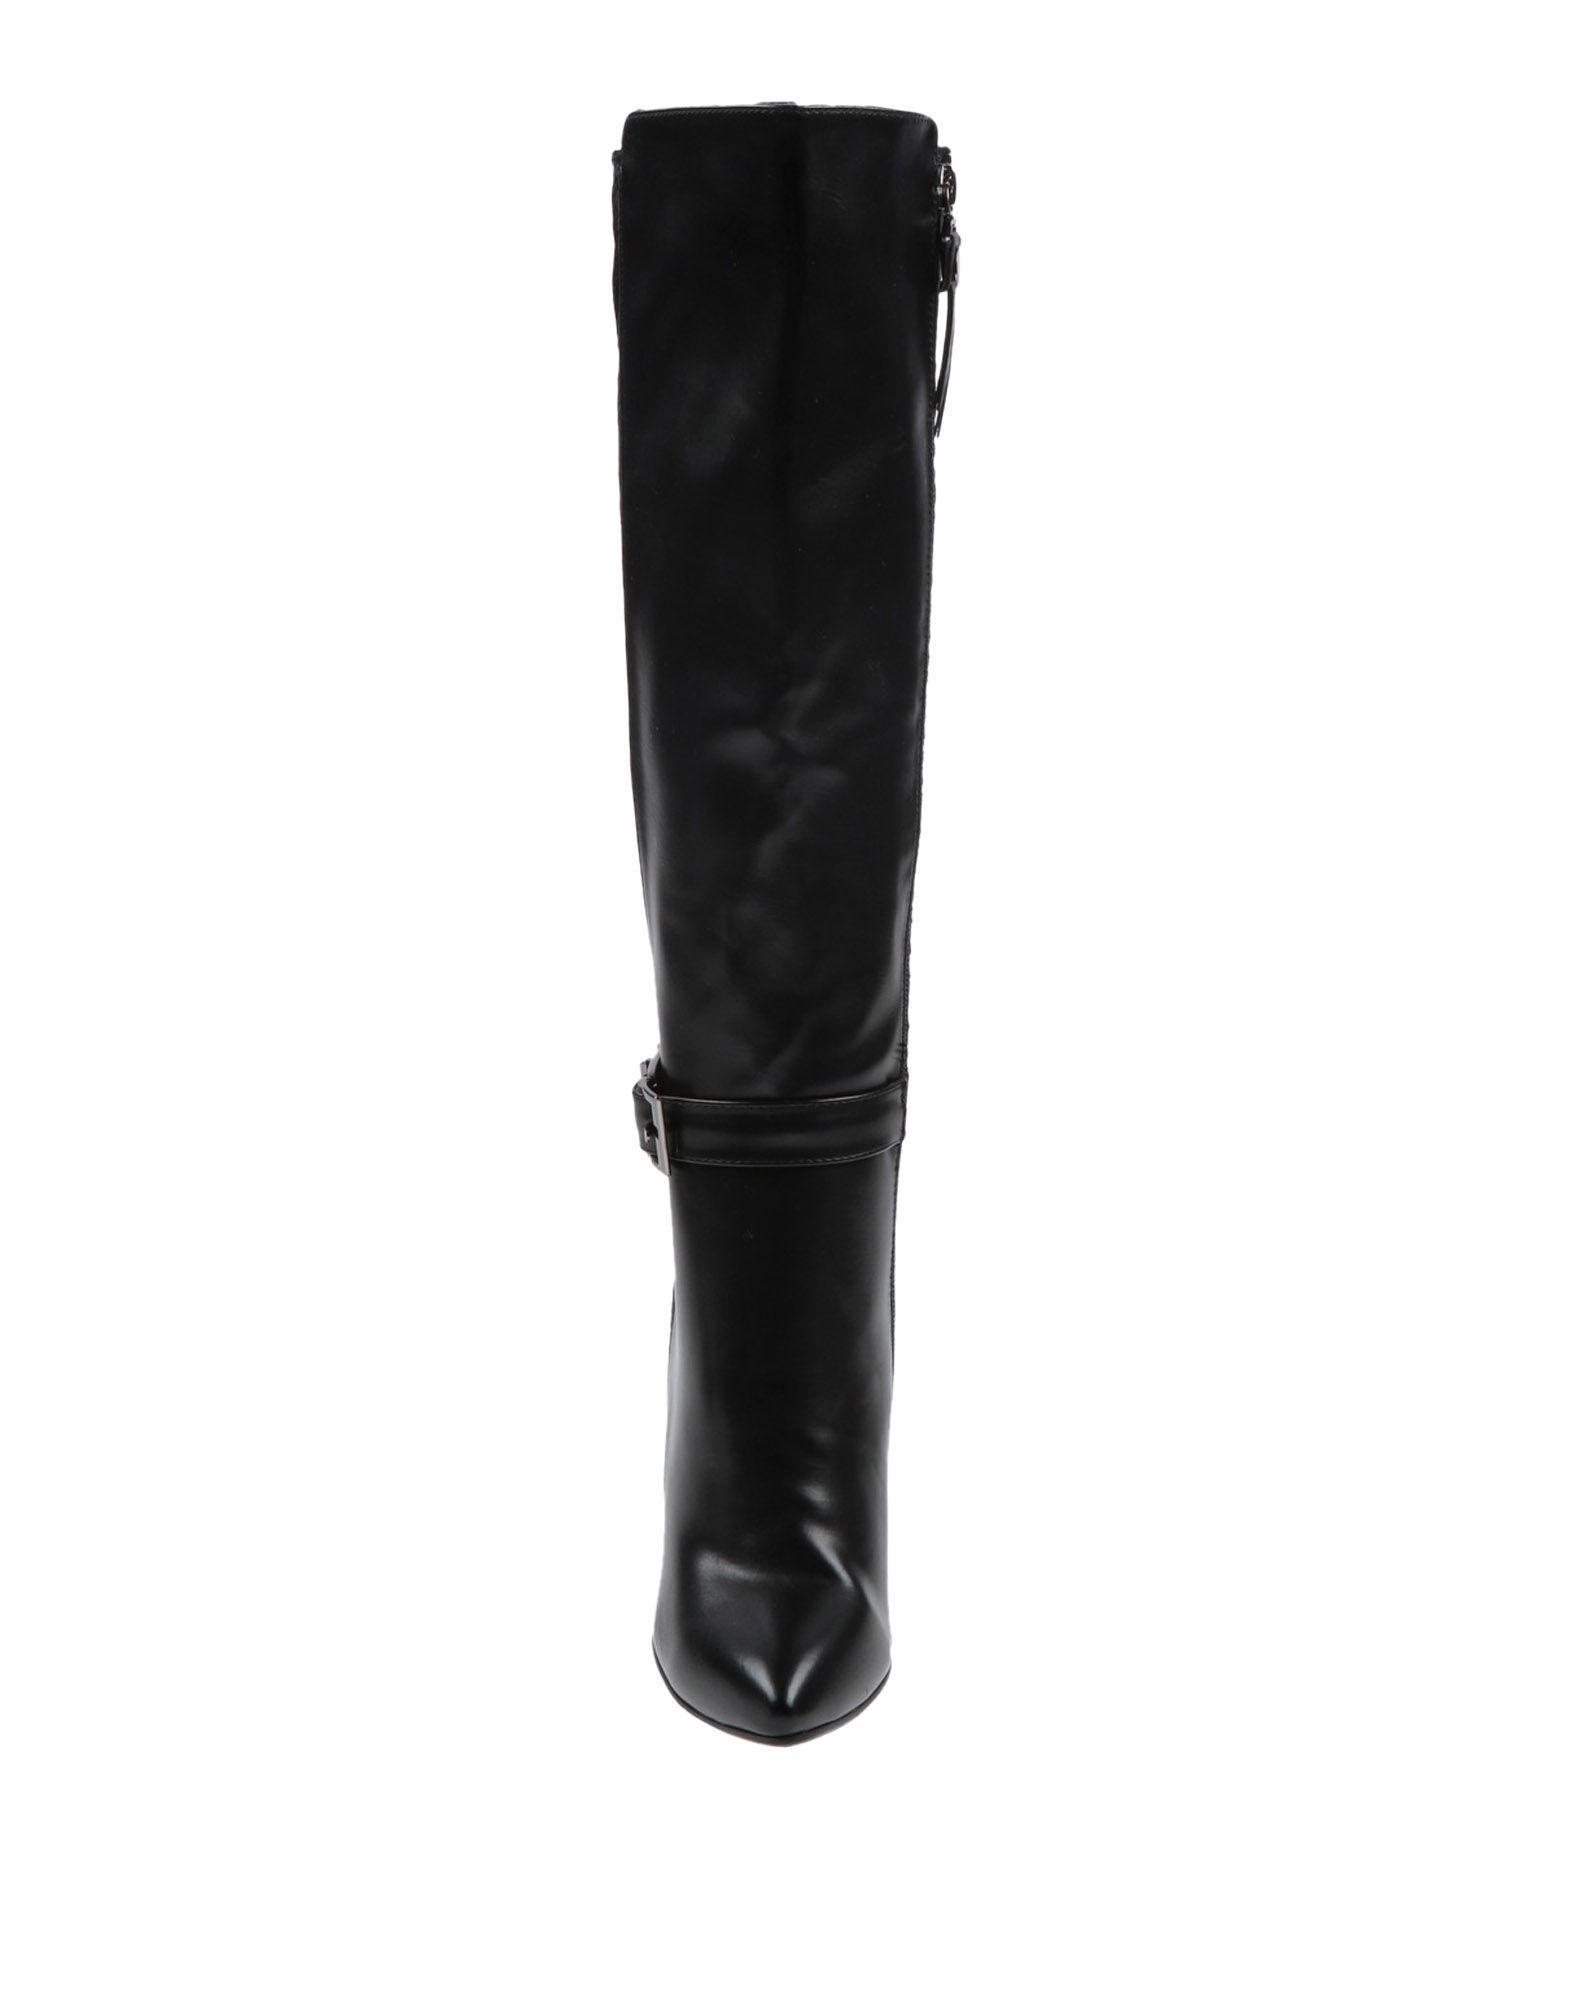 Tua By Braccialini Stiefel Damen  11538488CG Gute Qualität beliebte Schuhe